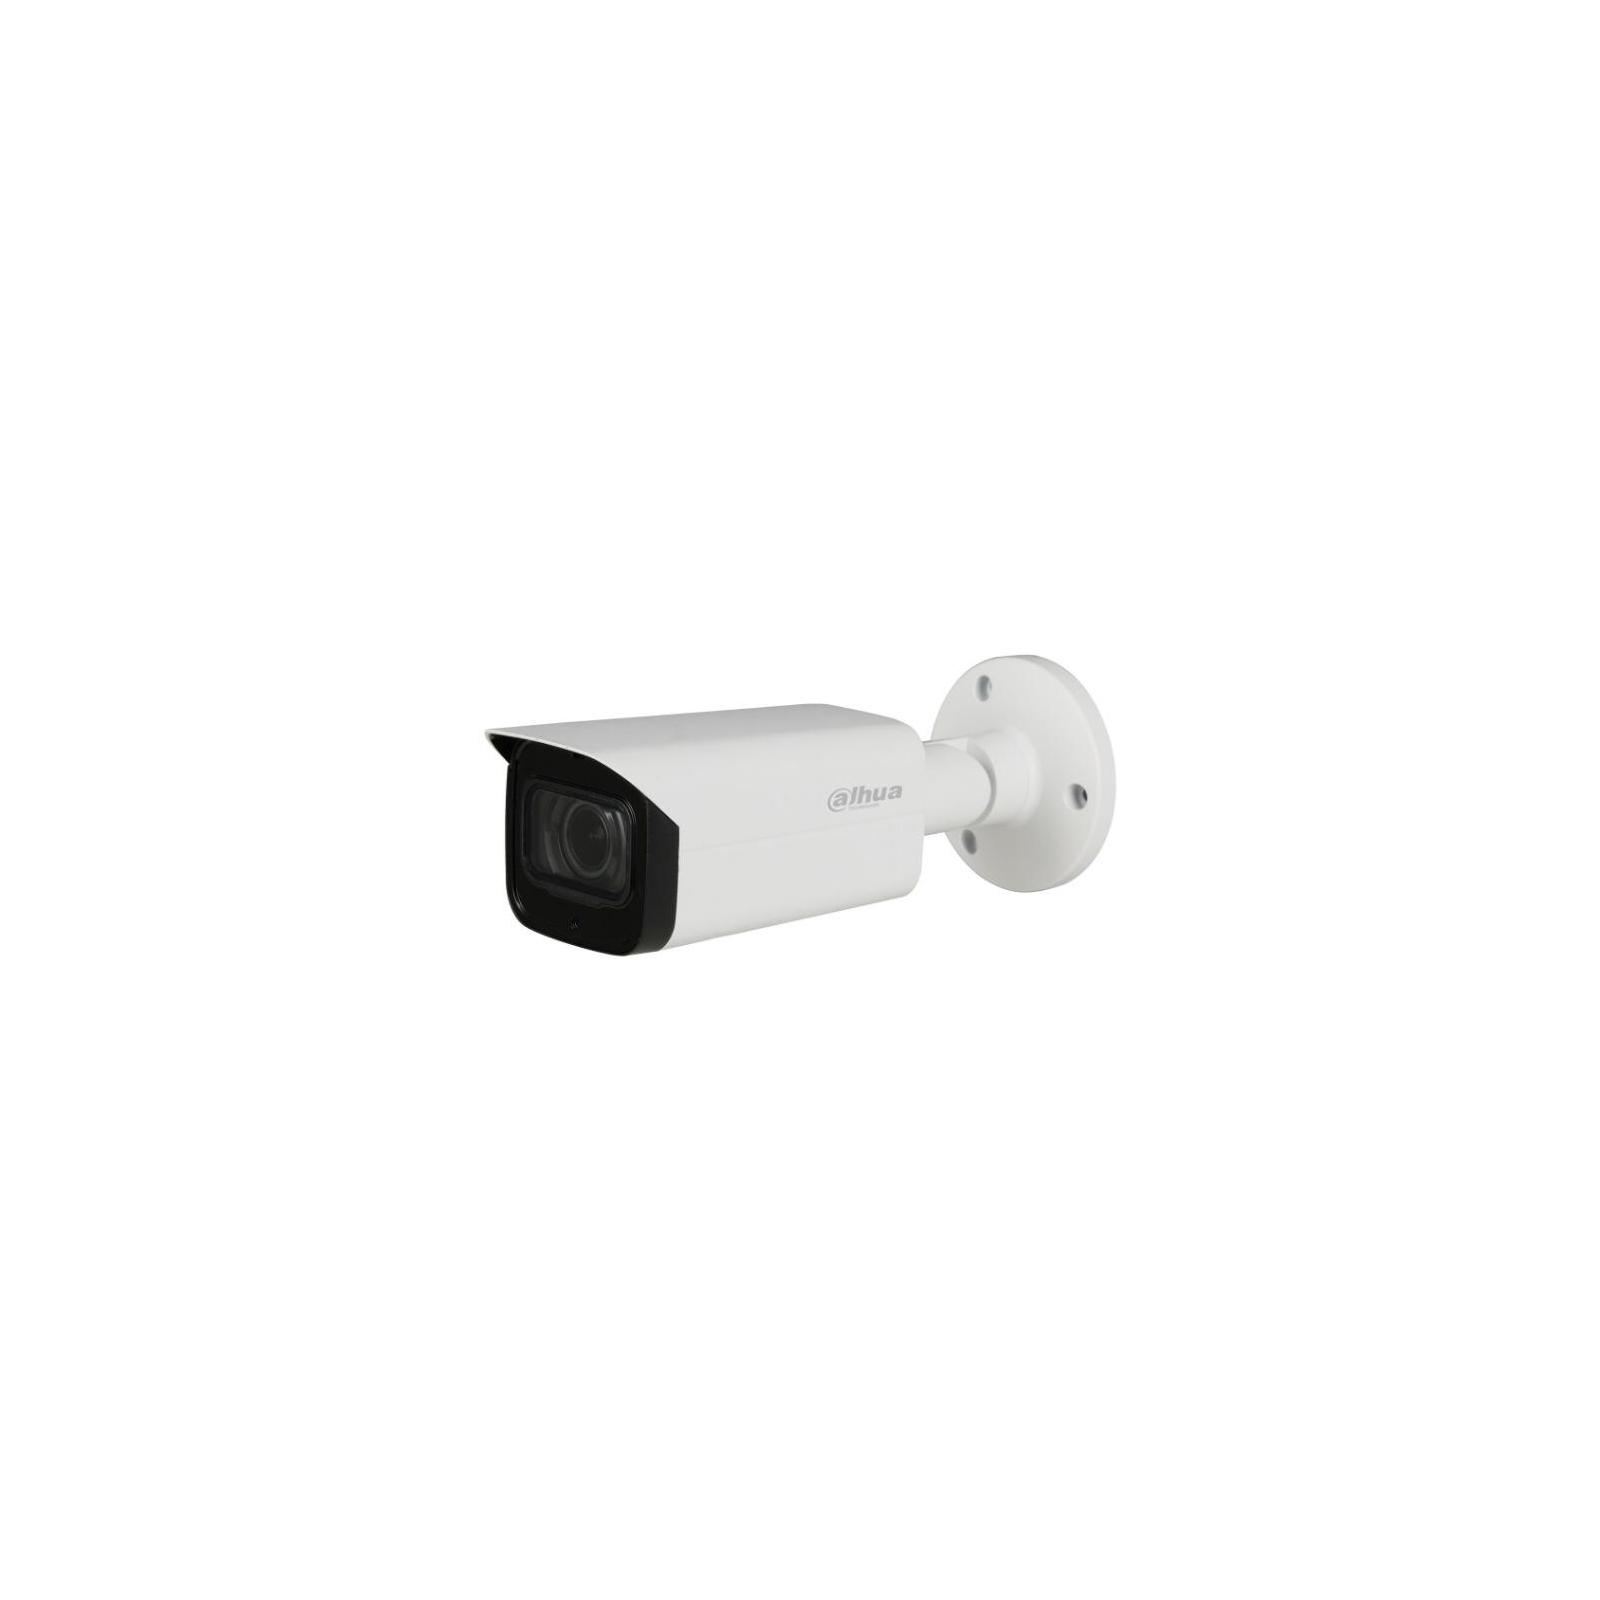 Камера видеонаблюдения Dahua DH-HAC-HFW2241TP-Z-A (2.7-13.5) (04781-06059)